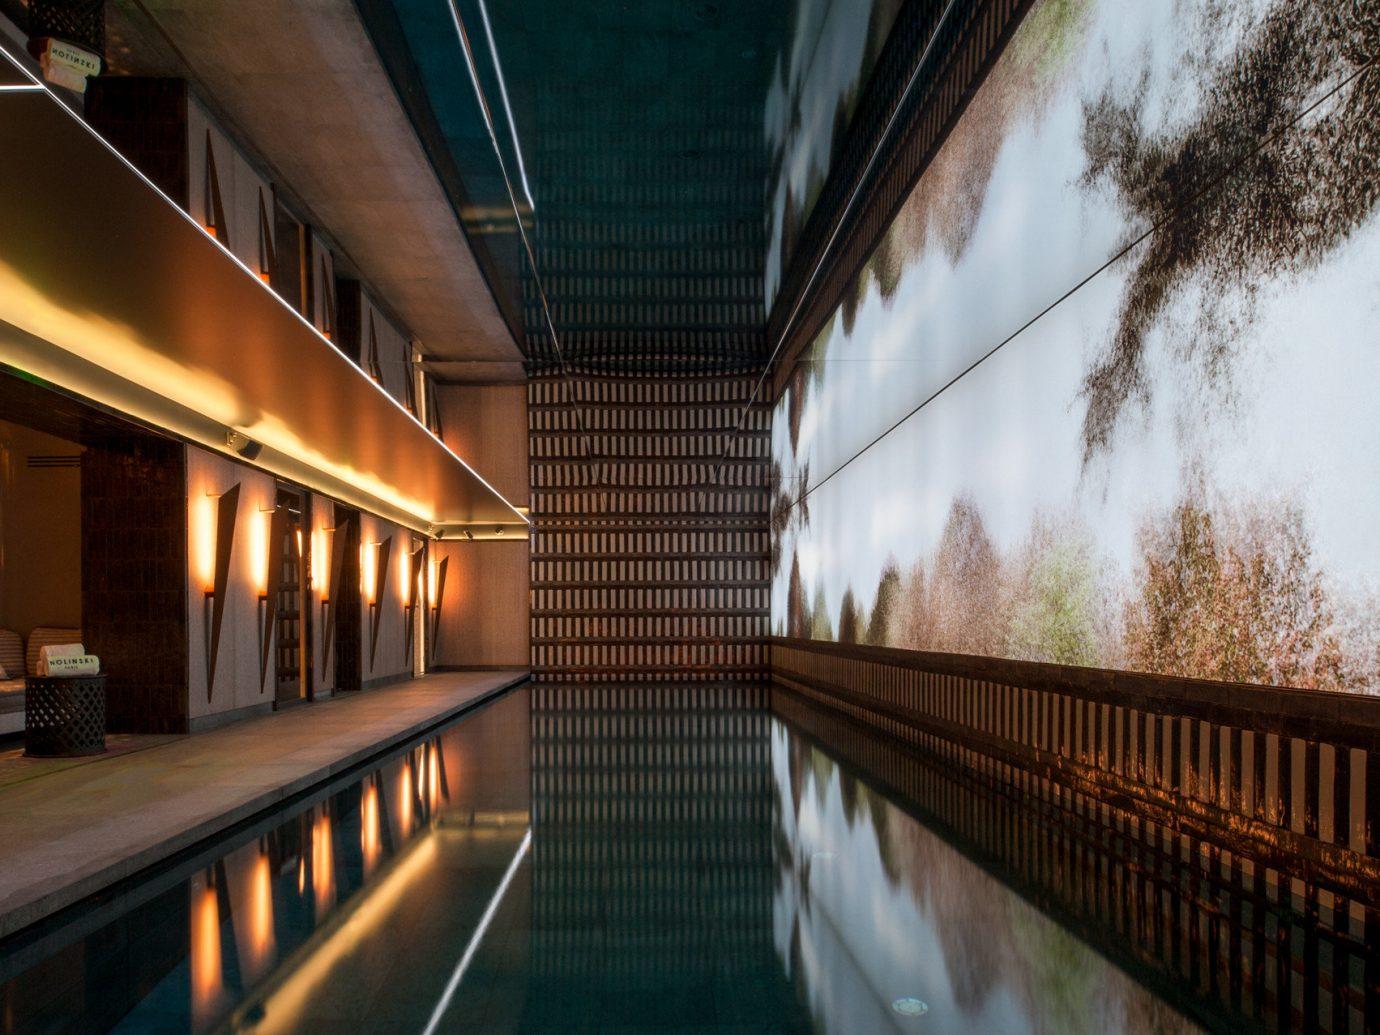 ambient lighting decor Elegant extravagant fancy indoor pool interior Luxury Pool reflection regal sophisticated Style + Design Trip Ideas urban area light Architecture interior design walkway